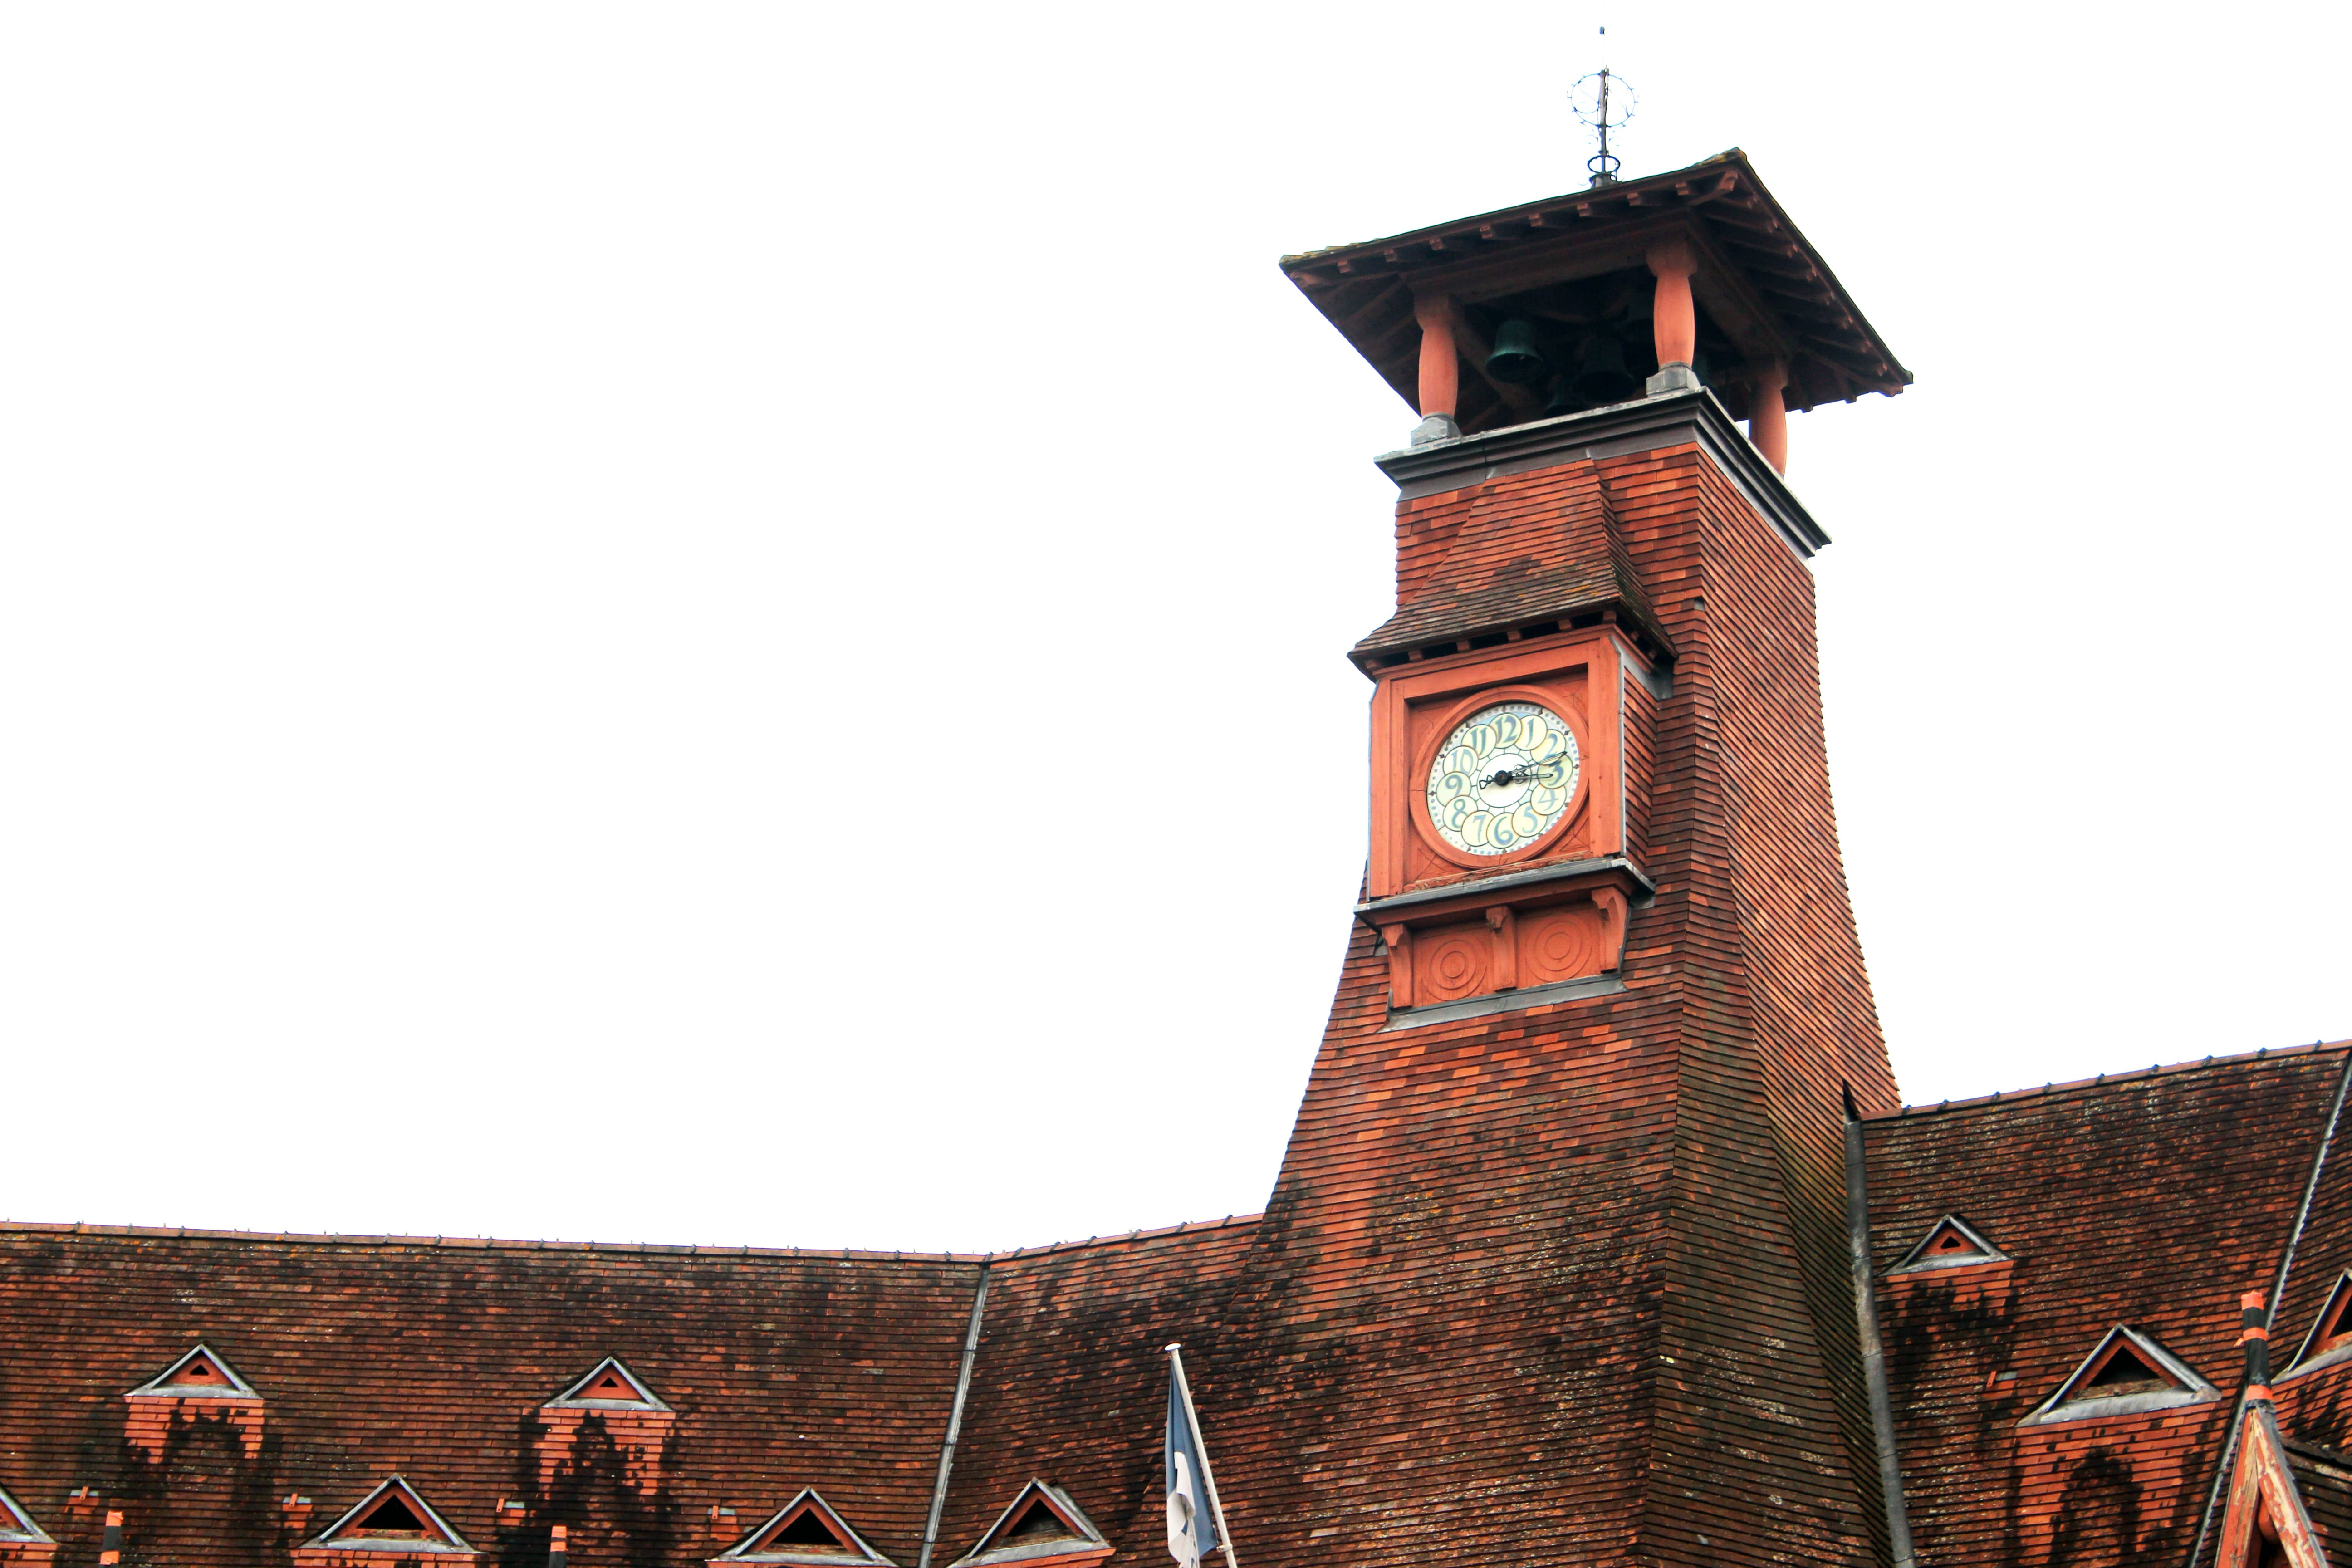 Horloge maison cantonale bastide